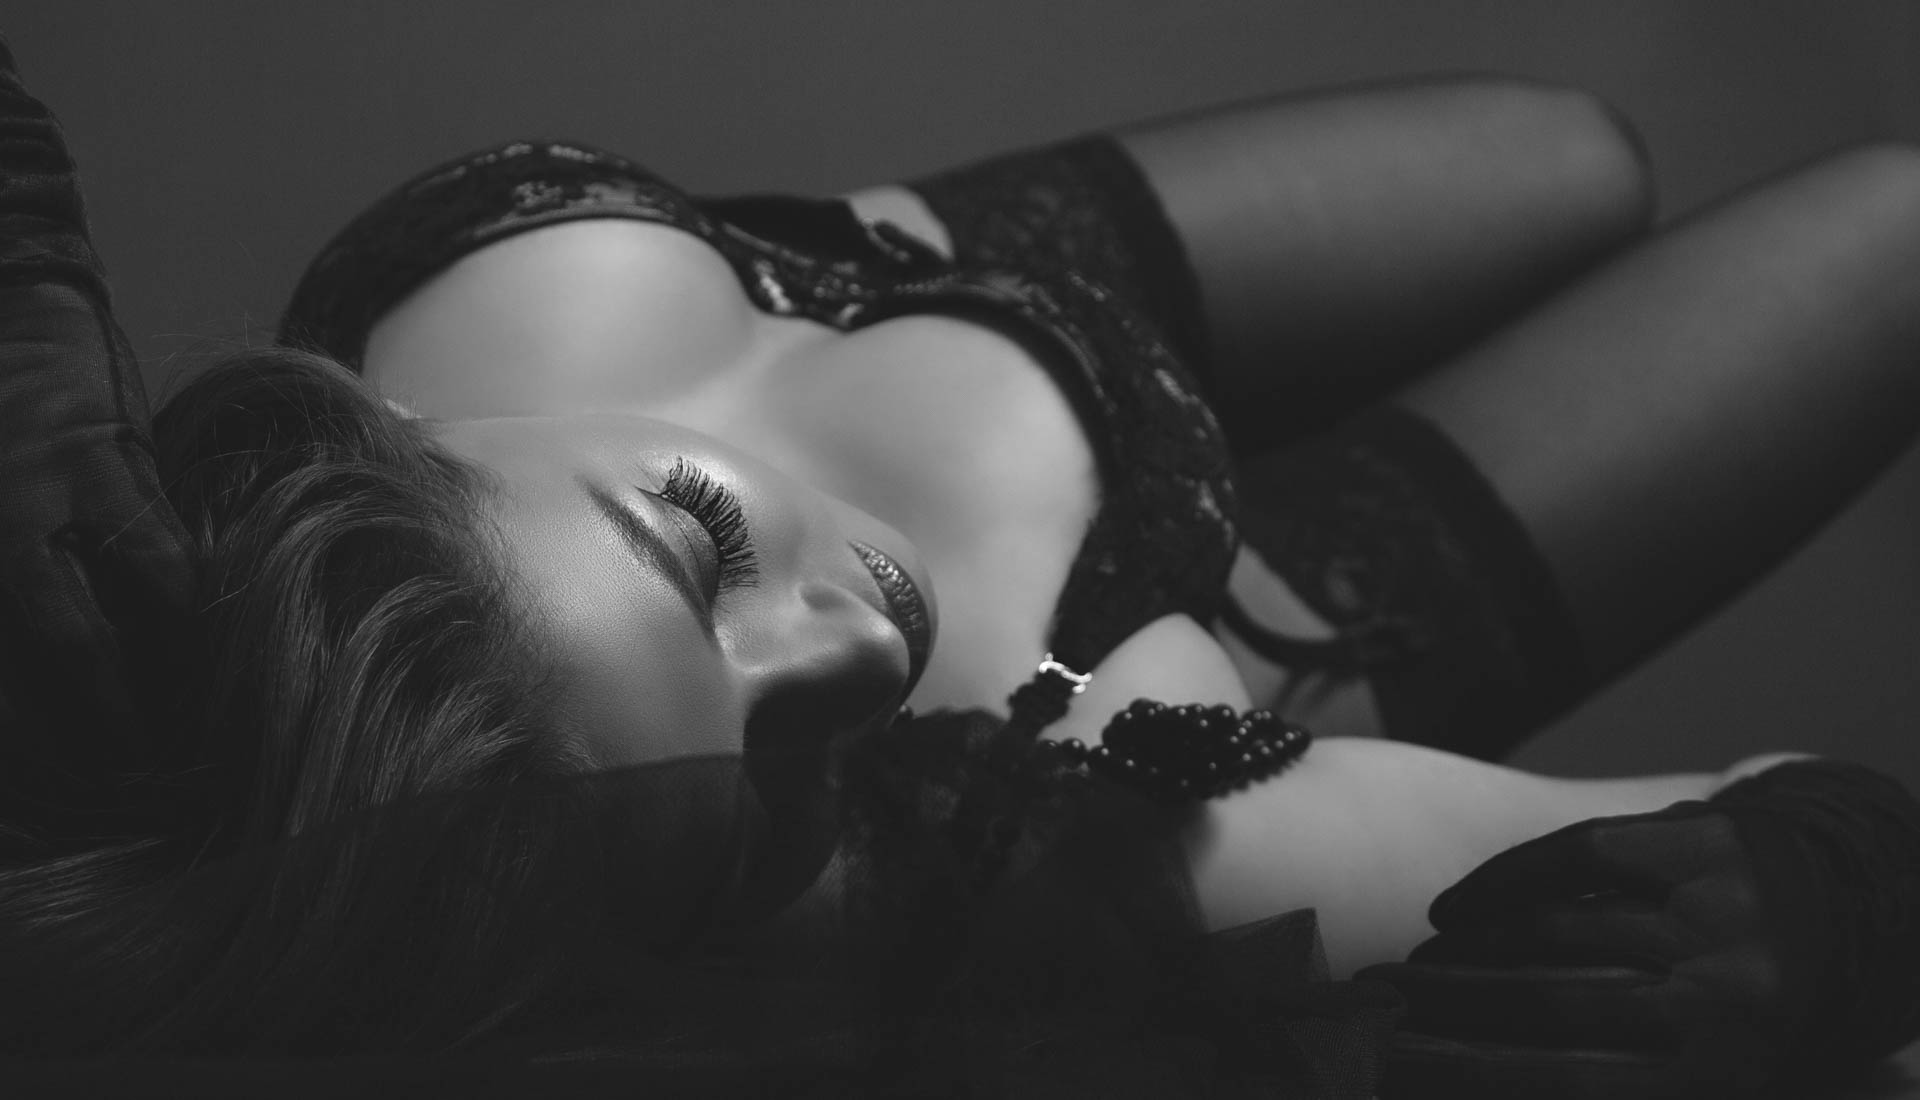 Birmingham boudoir and lingerie photography by Anastasia Jobson